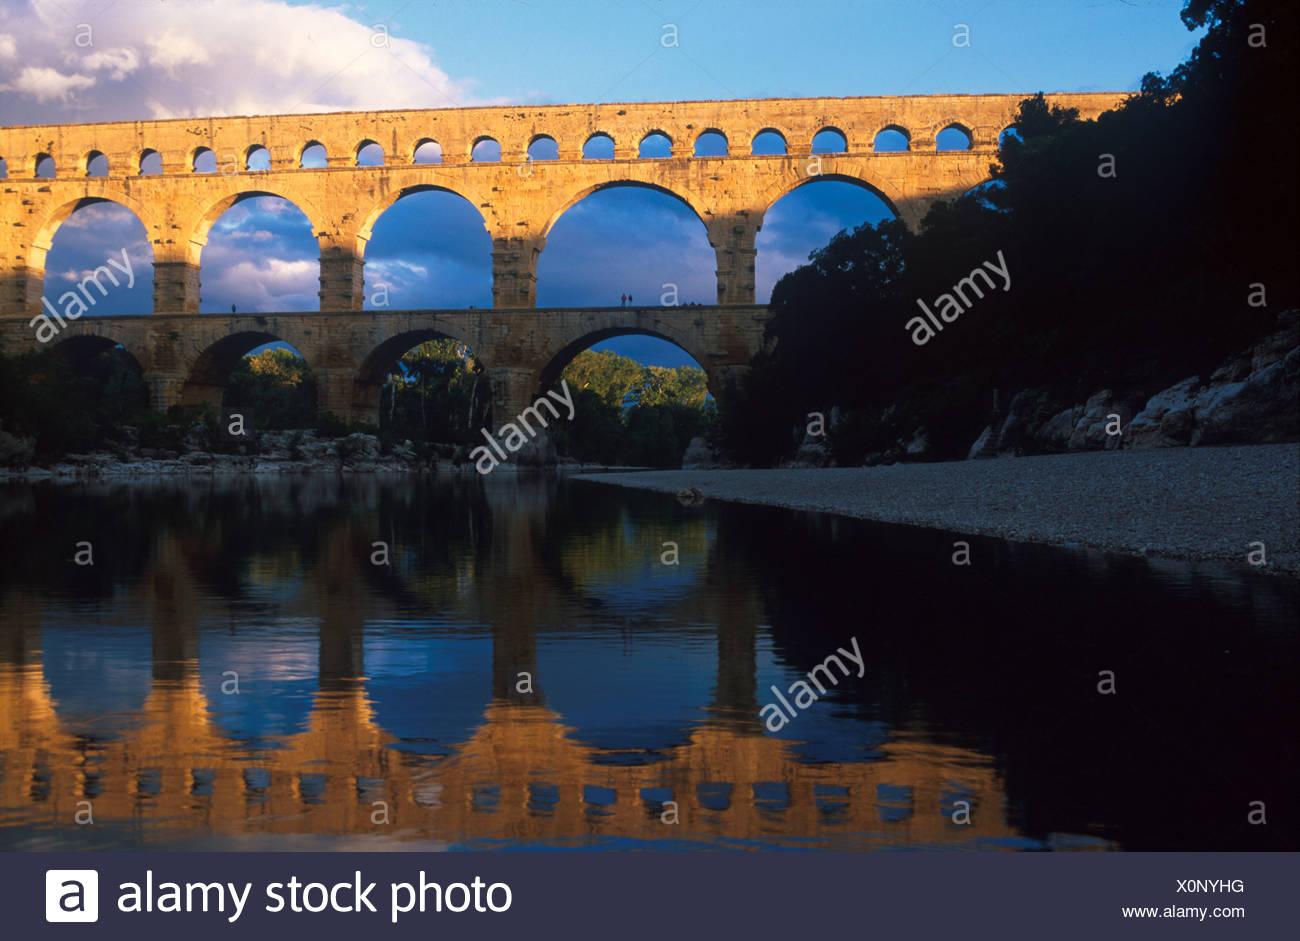 Mrz 92, Pont du Gard bei Avignon Provence, Frankreich - Stock Image